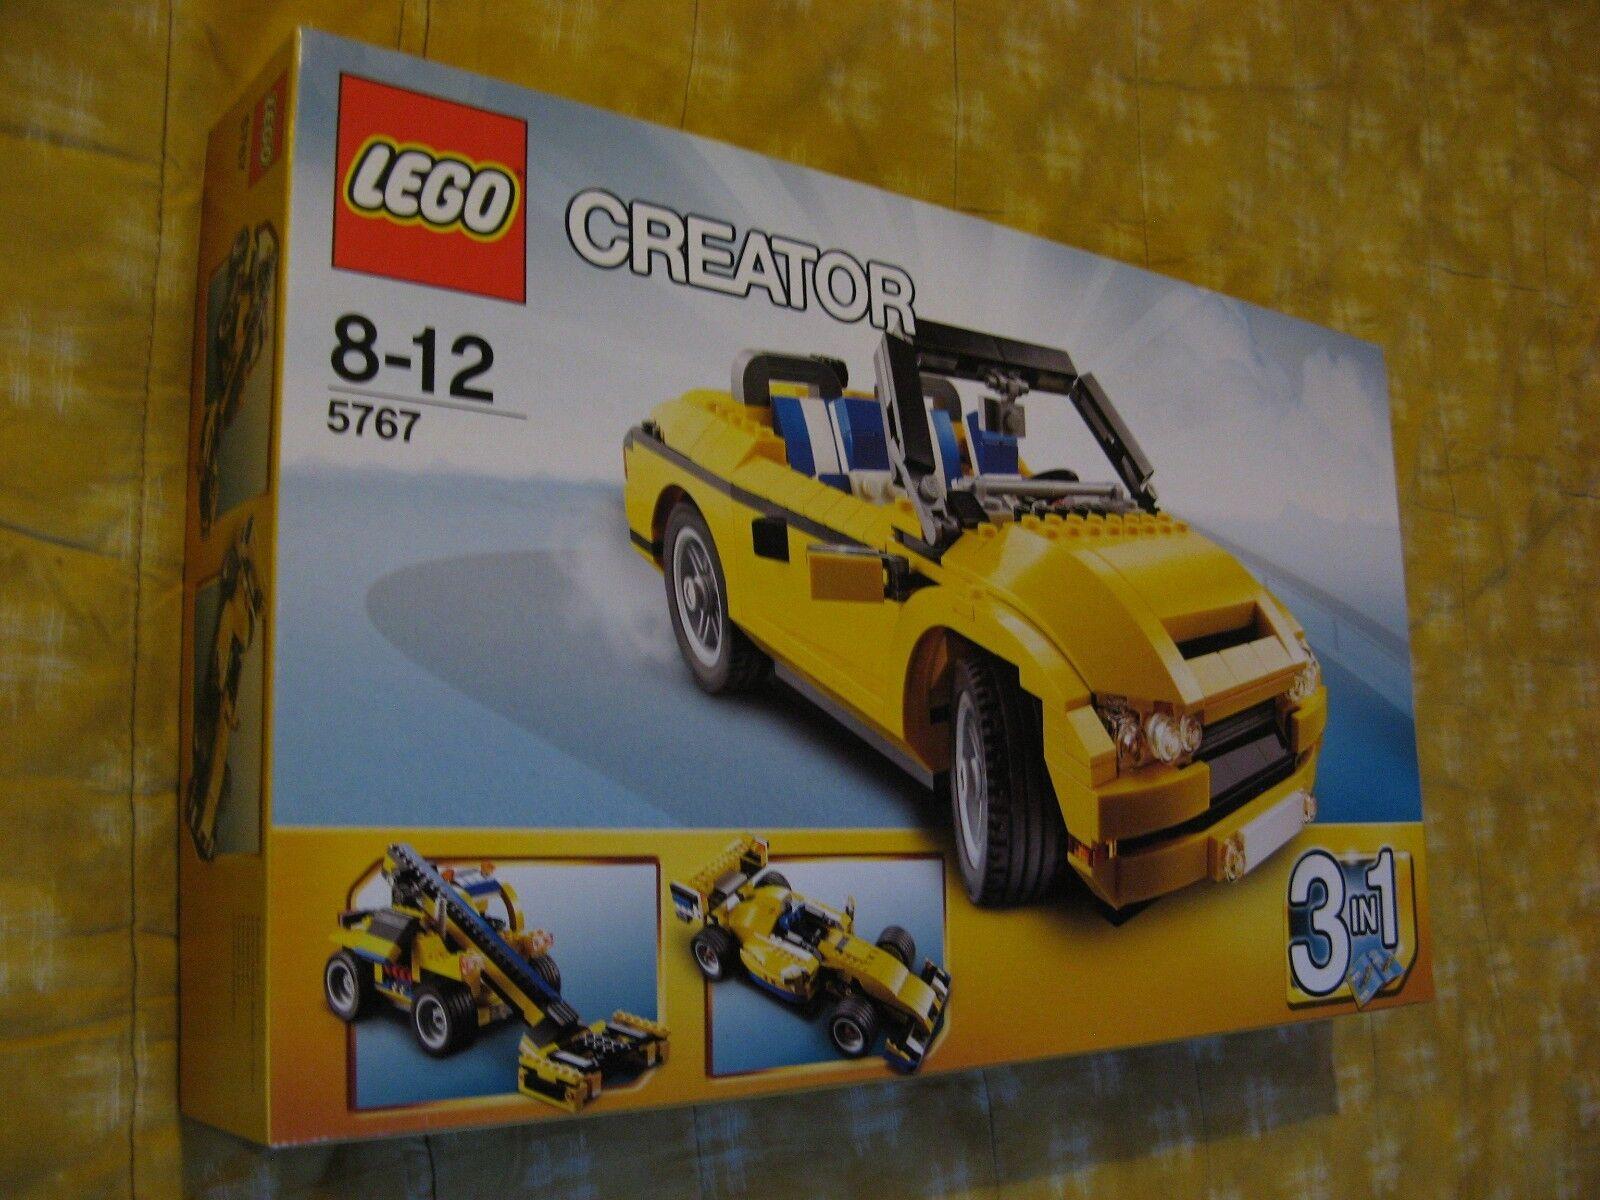 LEGO CREATOR 5767 VOITURE CABRIOLET TECHNIC COOL COOL COOL CRUISER TECHNIK CAR FERRARI NEW 65e248